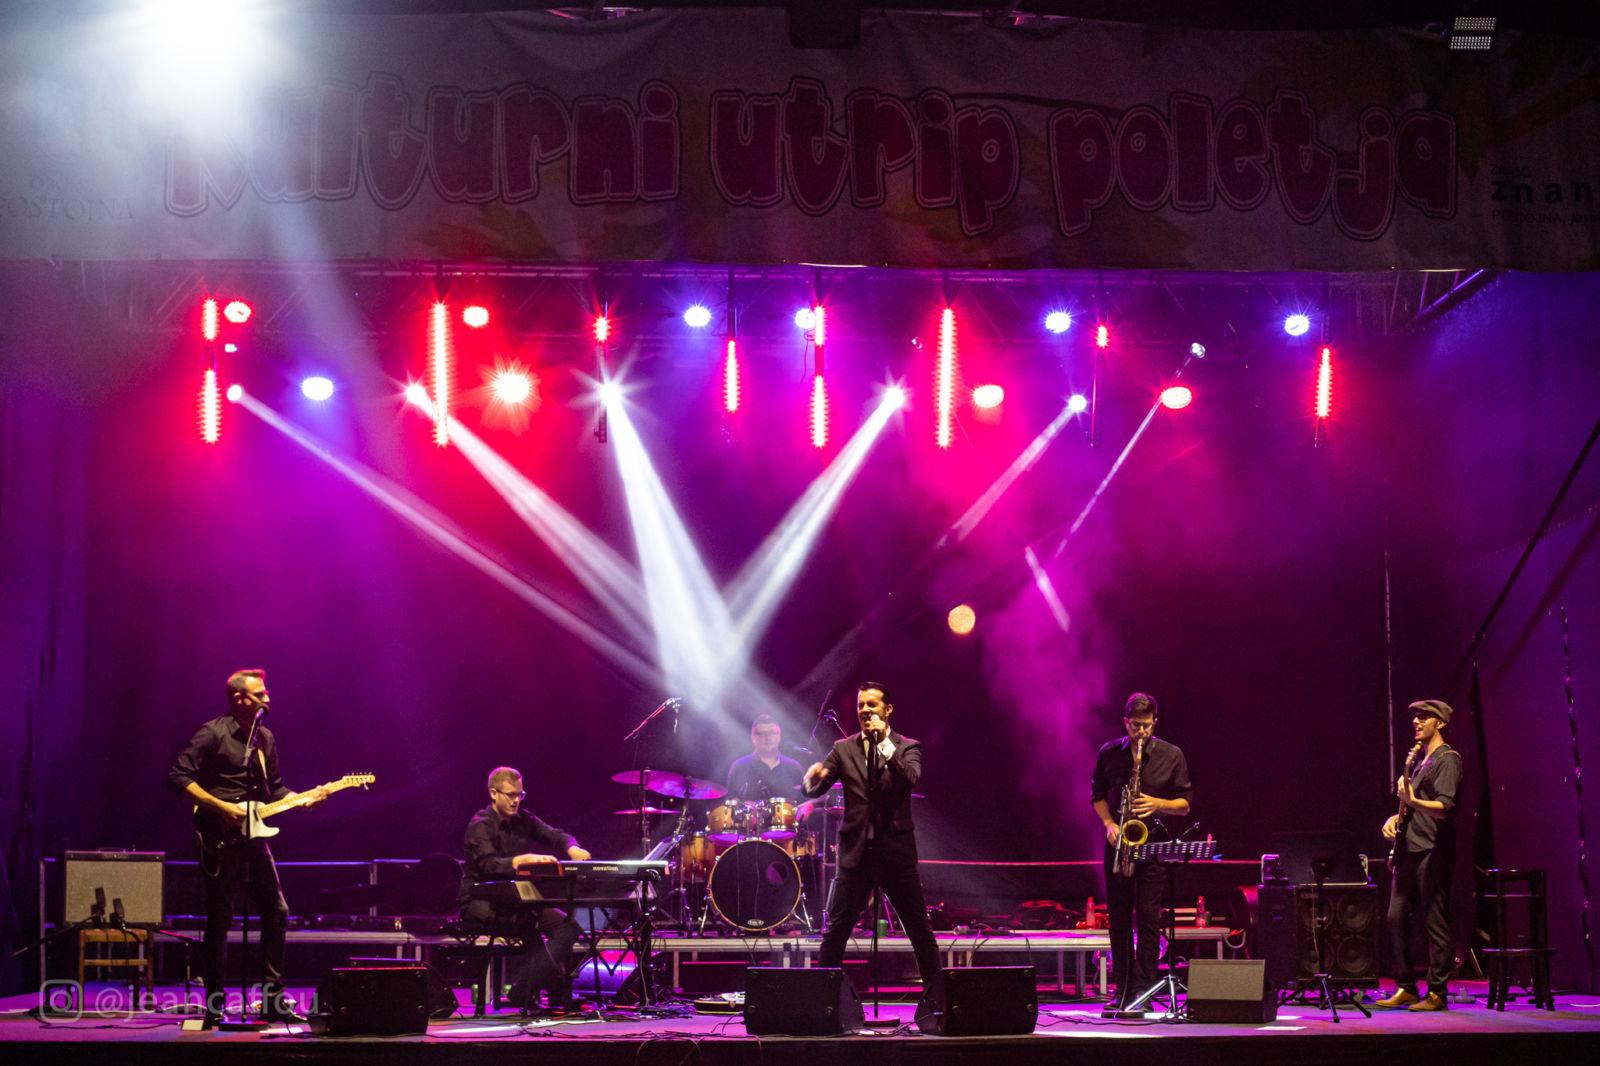 Rok'n'Band - Kulturni utrip poletja Postojna